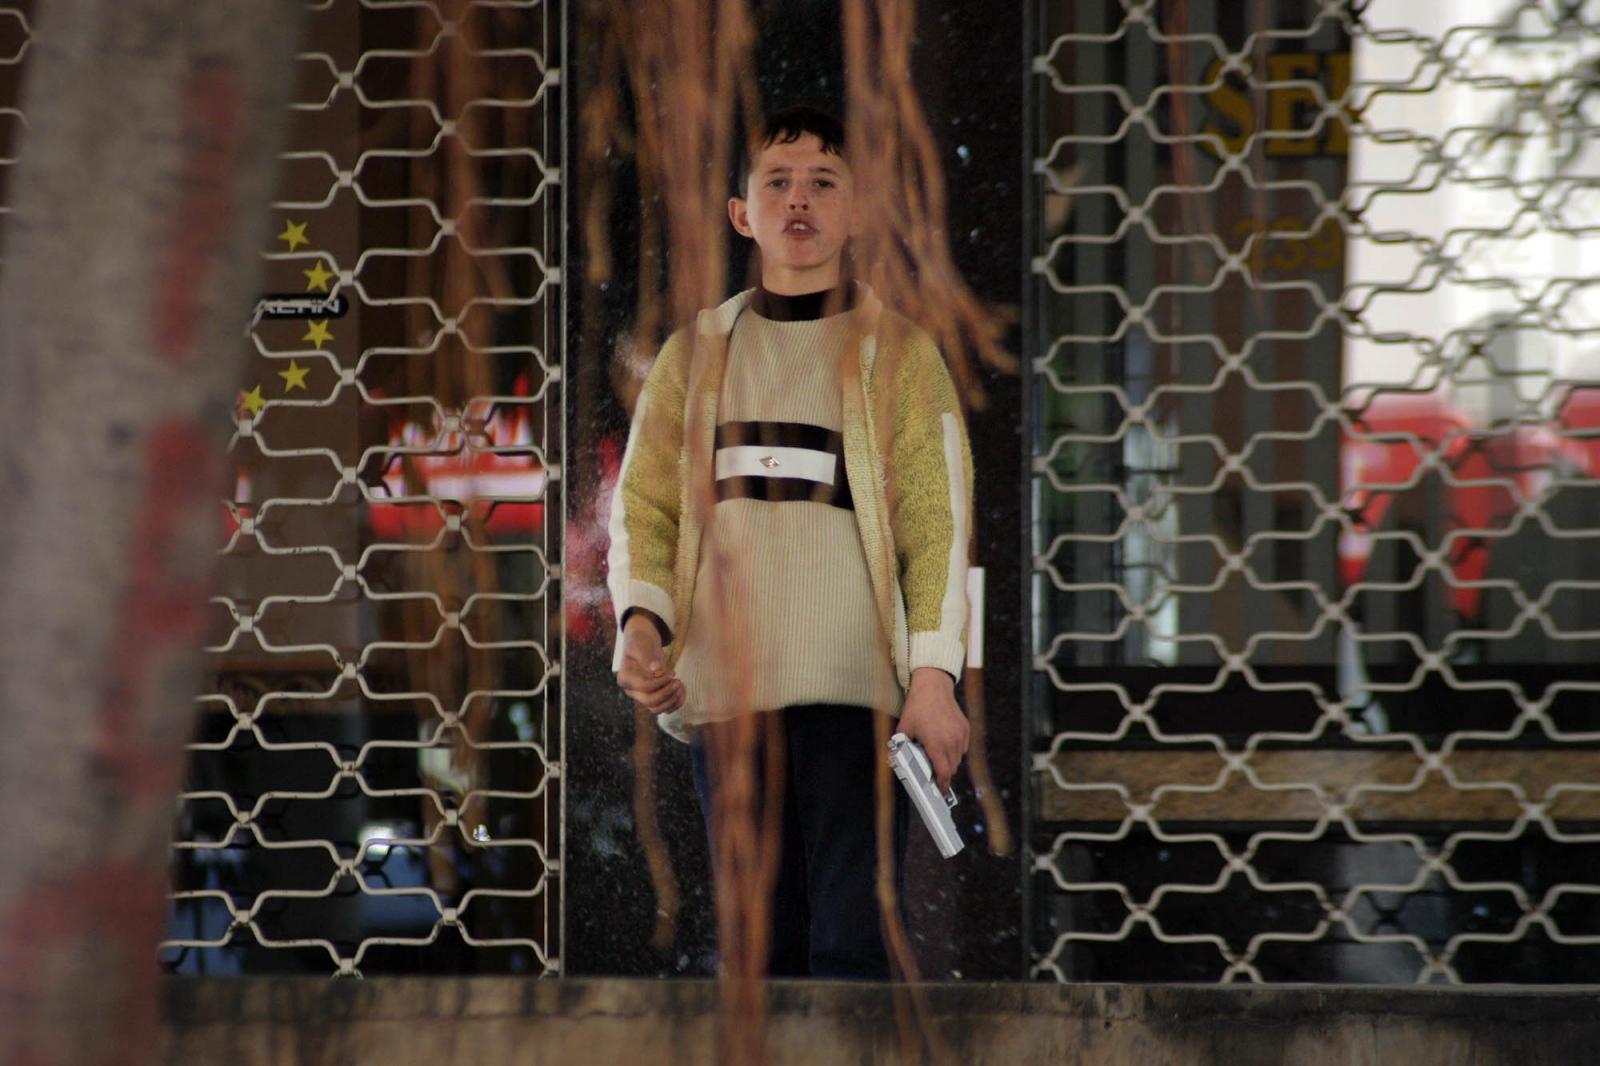 Boy with cigarette and toy gun, Mersin, Turkey